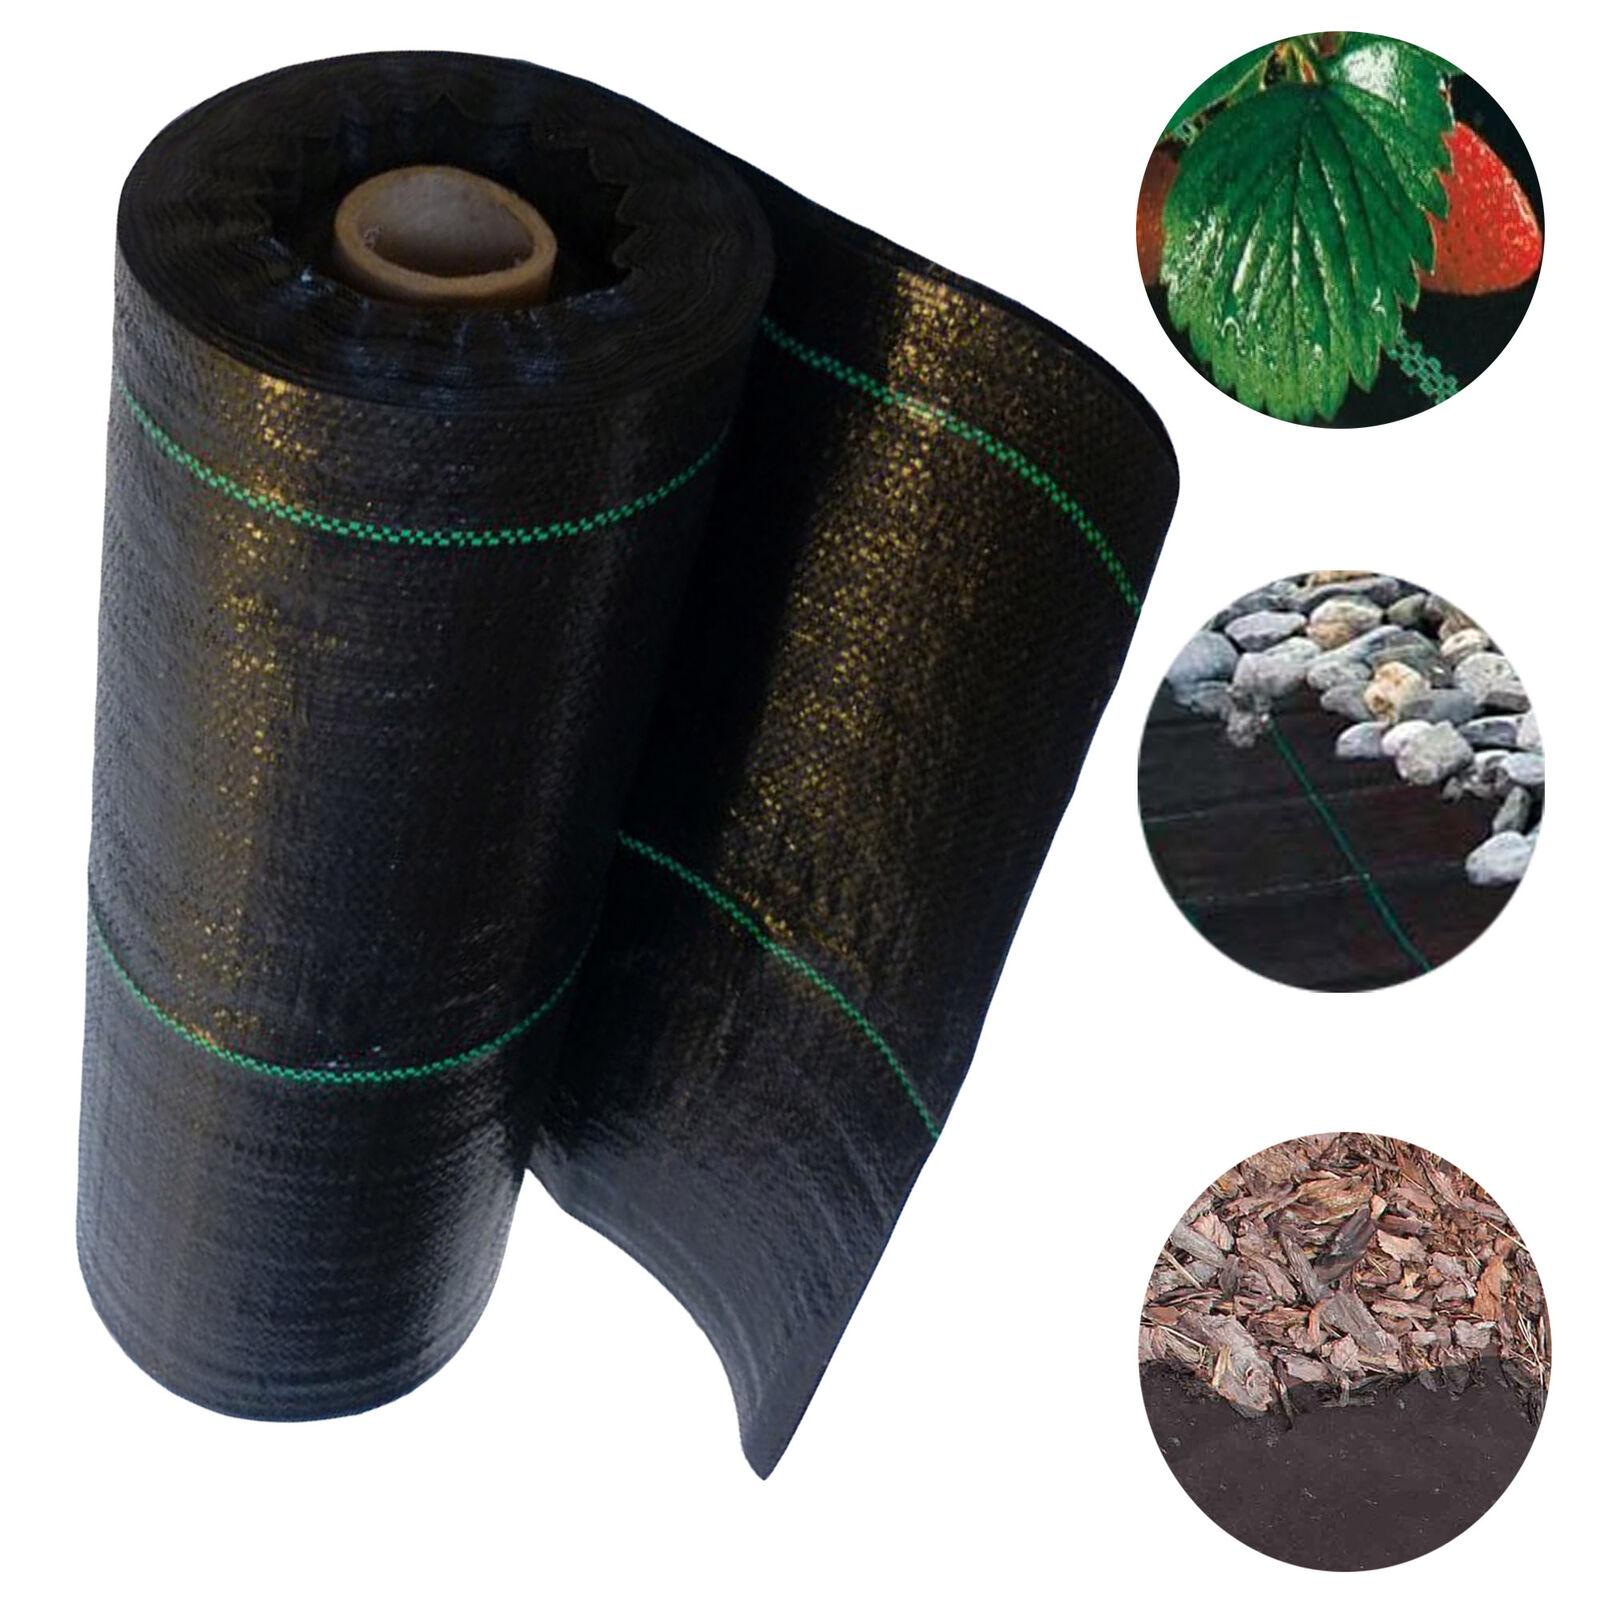 Malla antihierbas malla antihierbas tela suelo projo malas hierbas 90g 0,6m x 100m negro